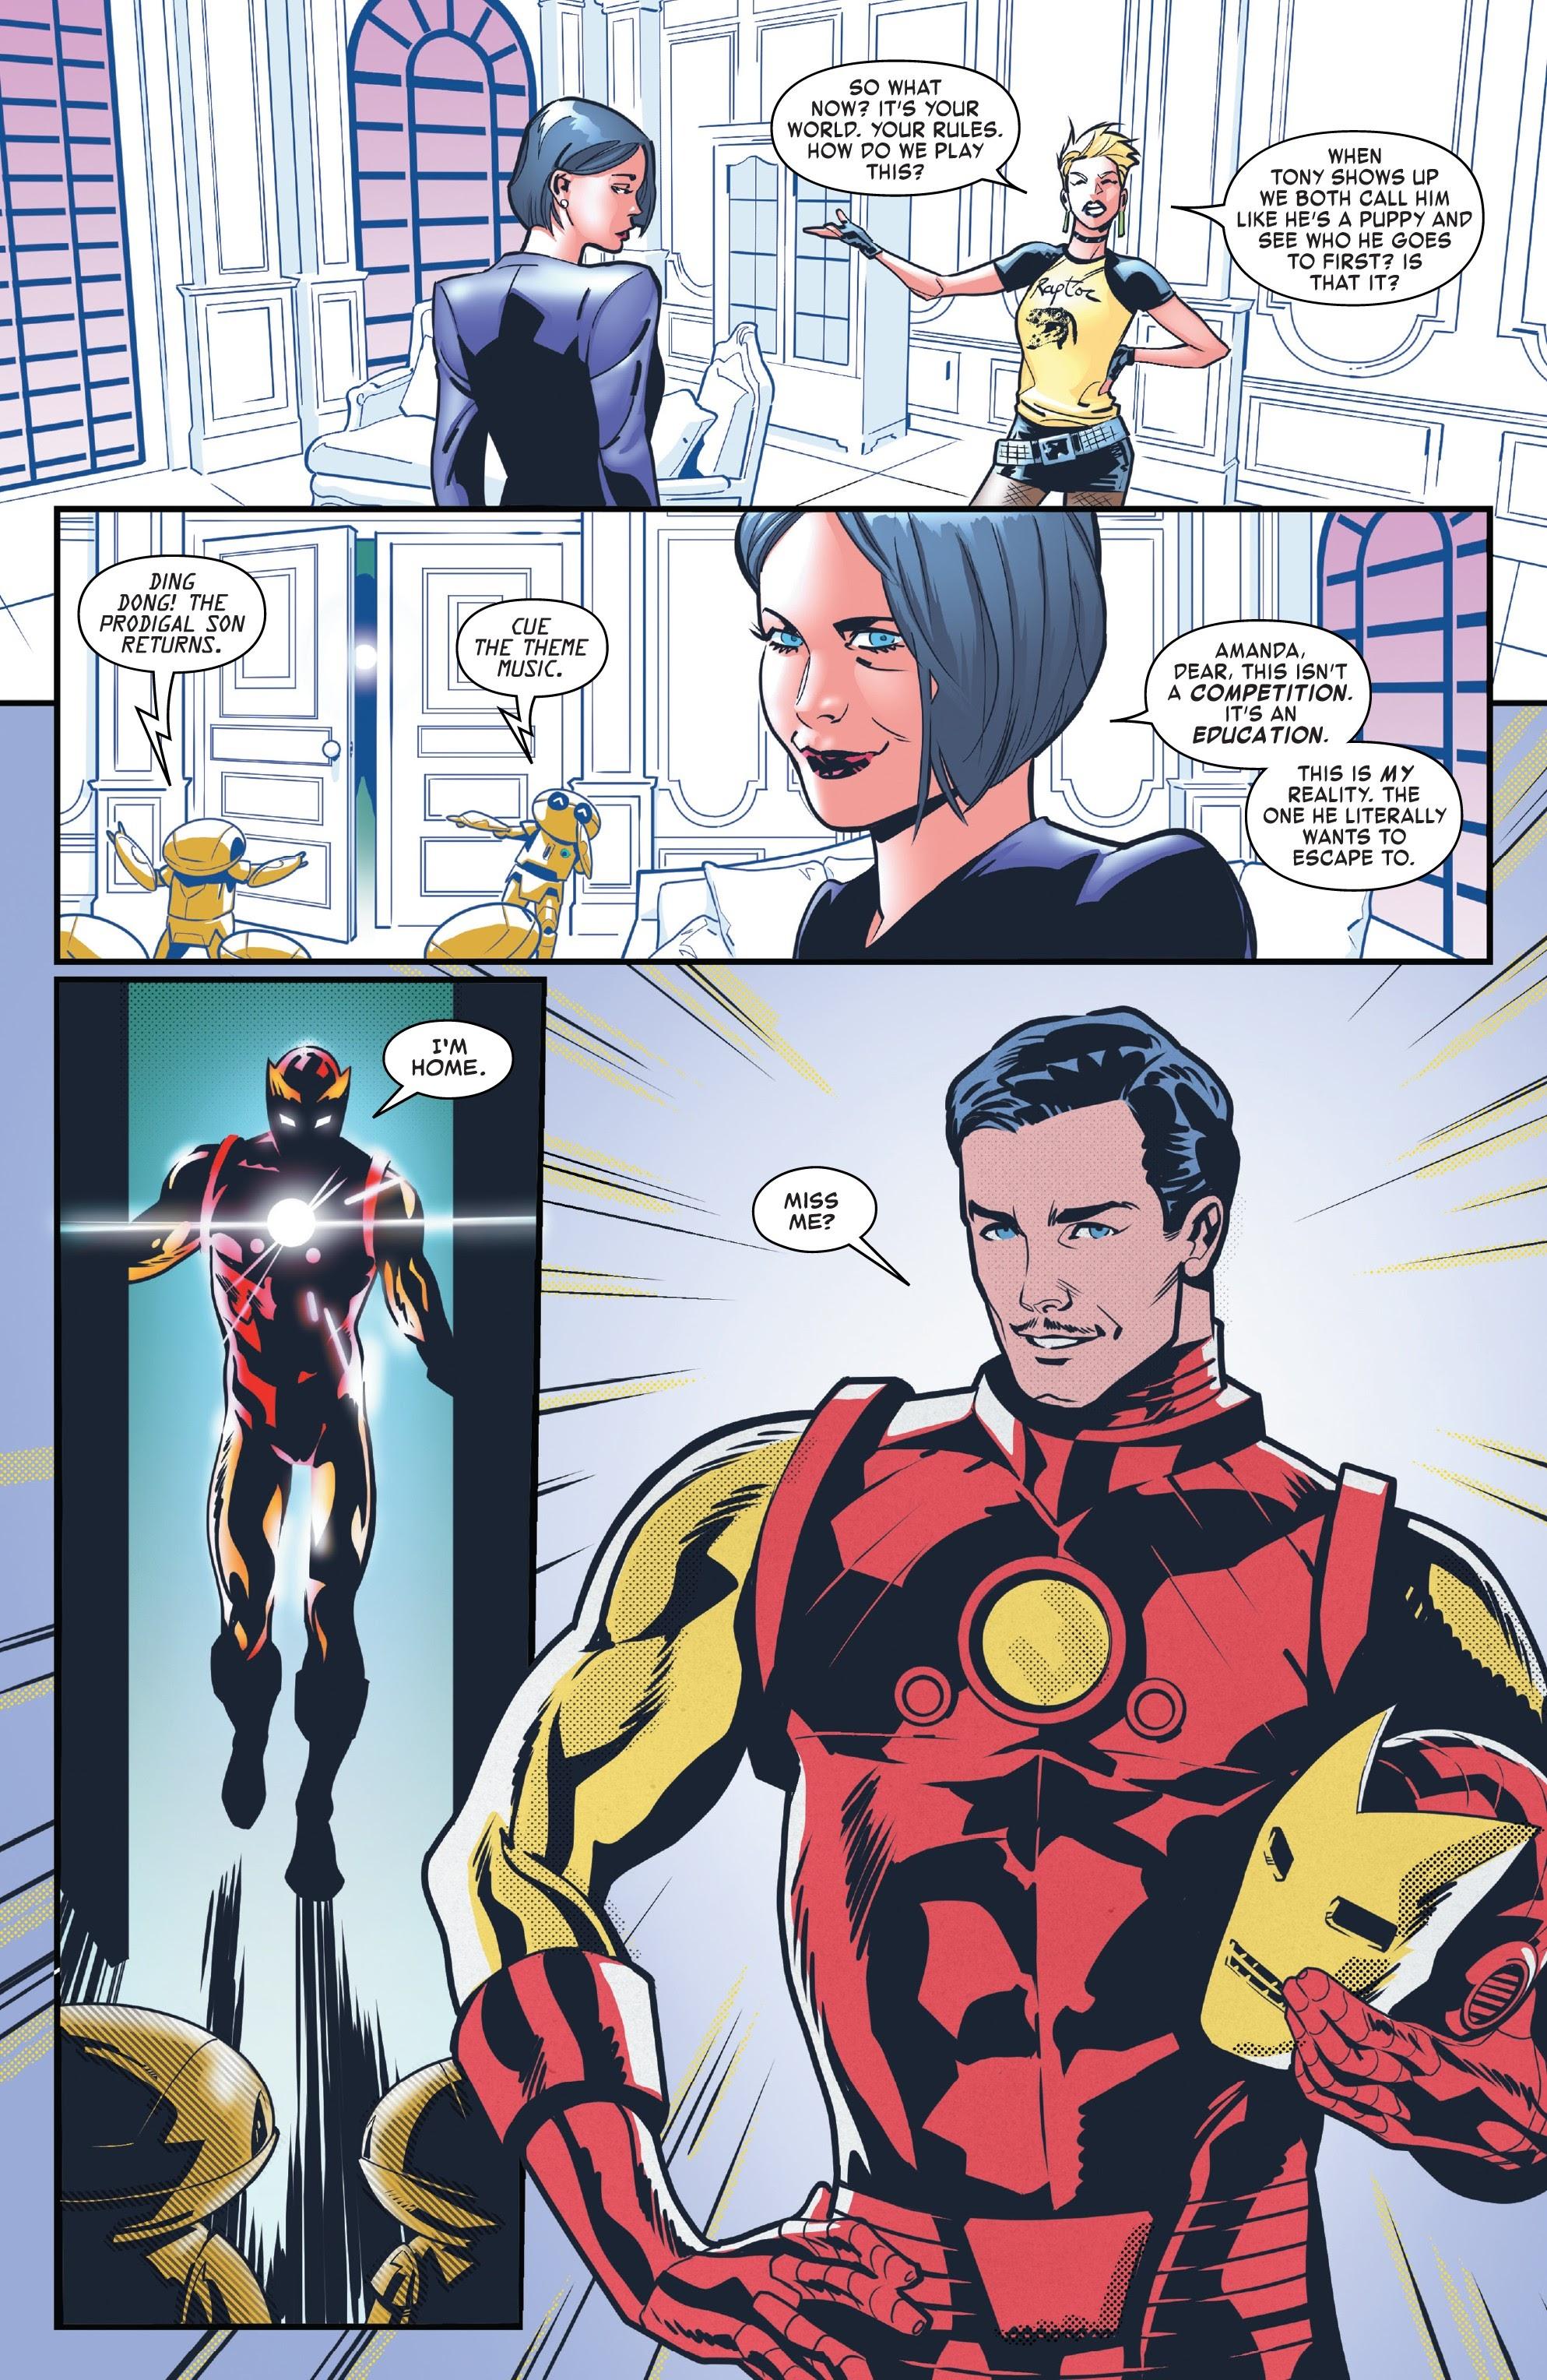 Read online Tony Stark: Iron Man comic -  Issue #8 - 20